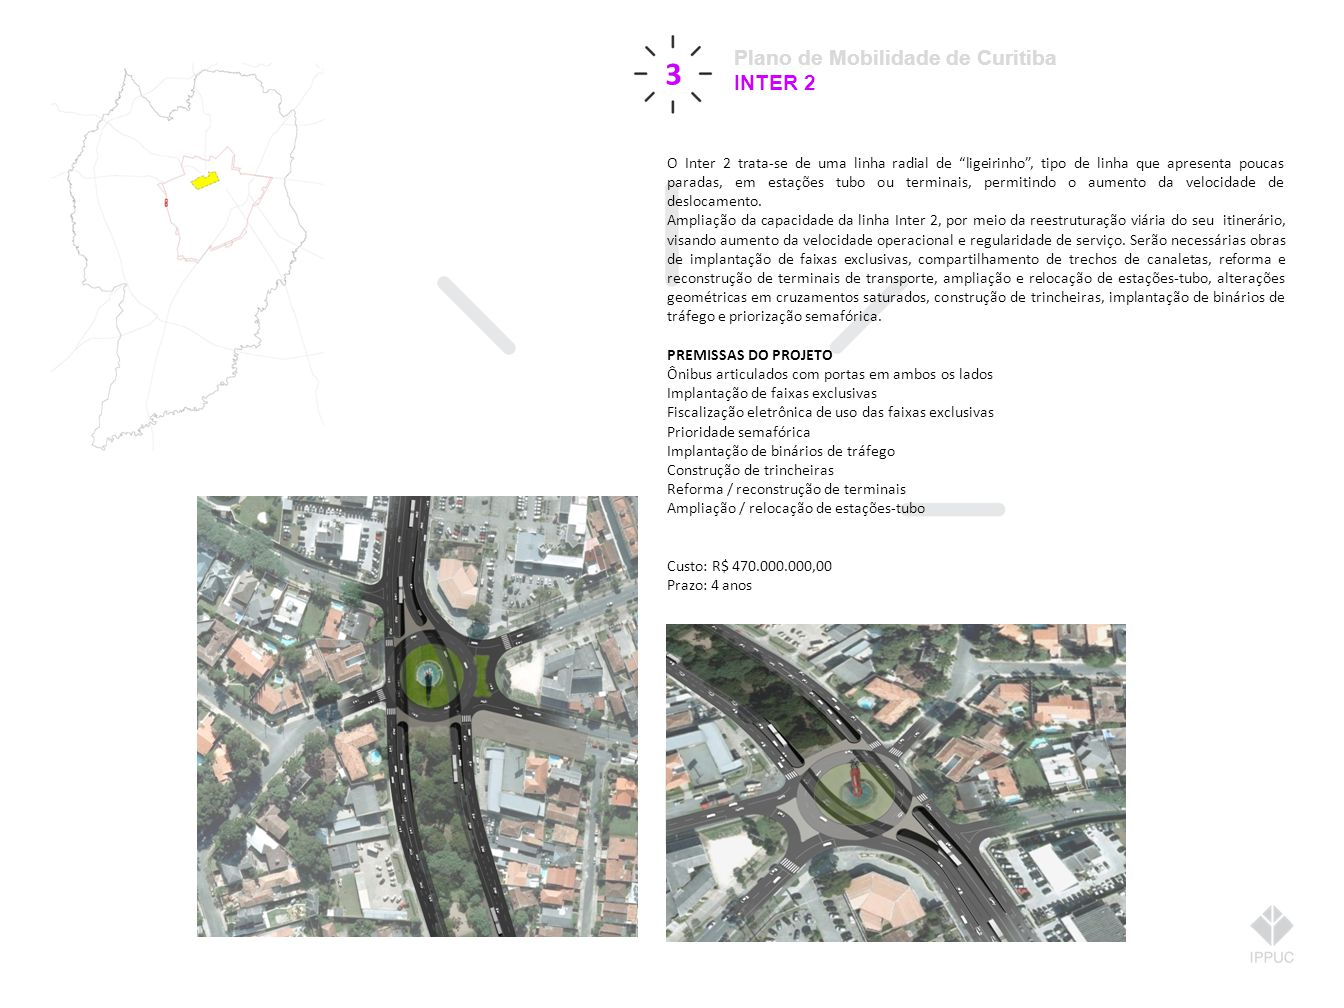 3 Plano de Mobilidade de Curitiba INTER 2